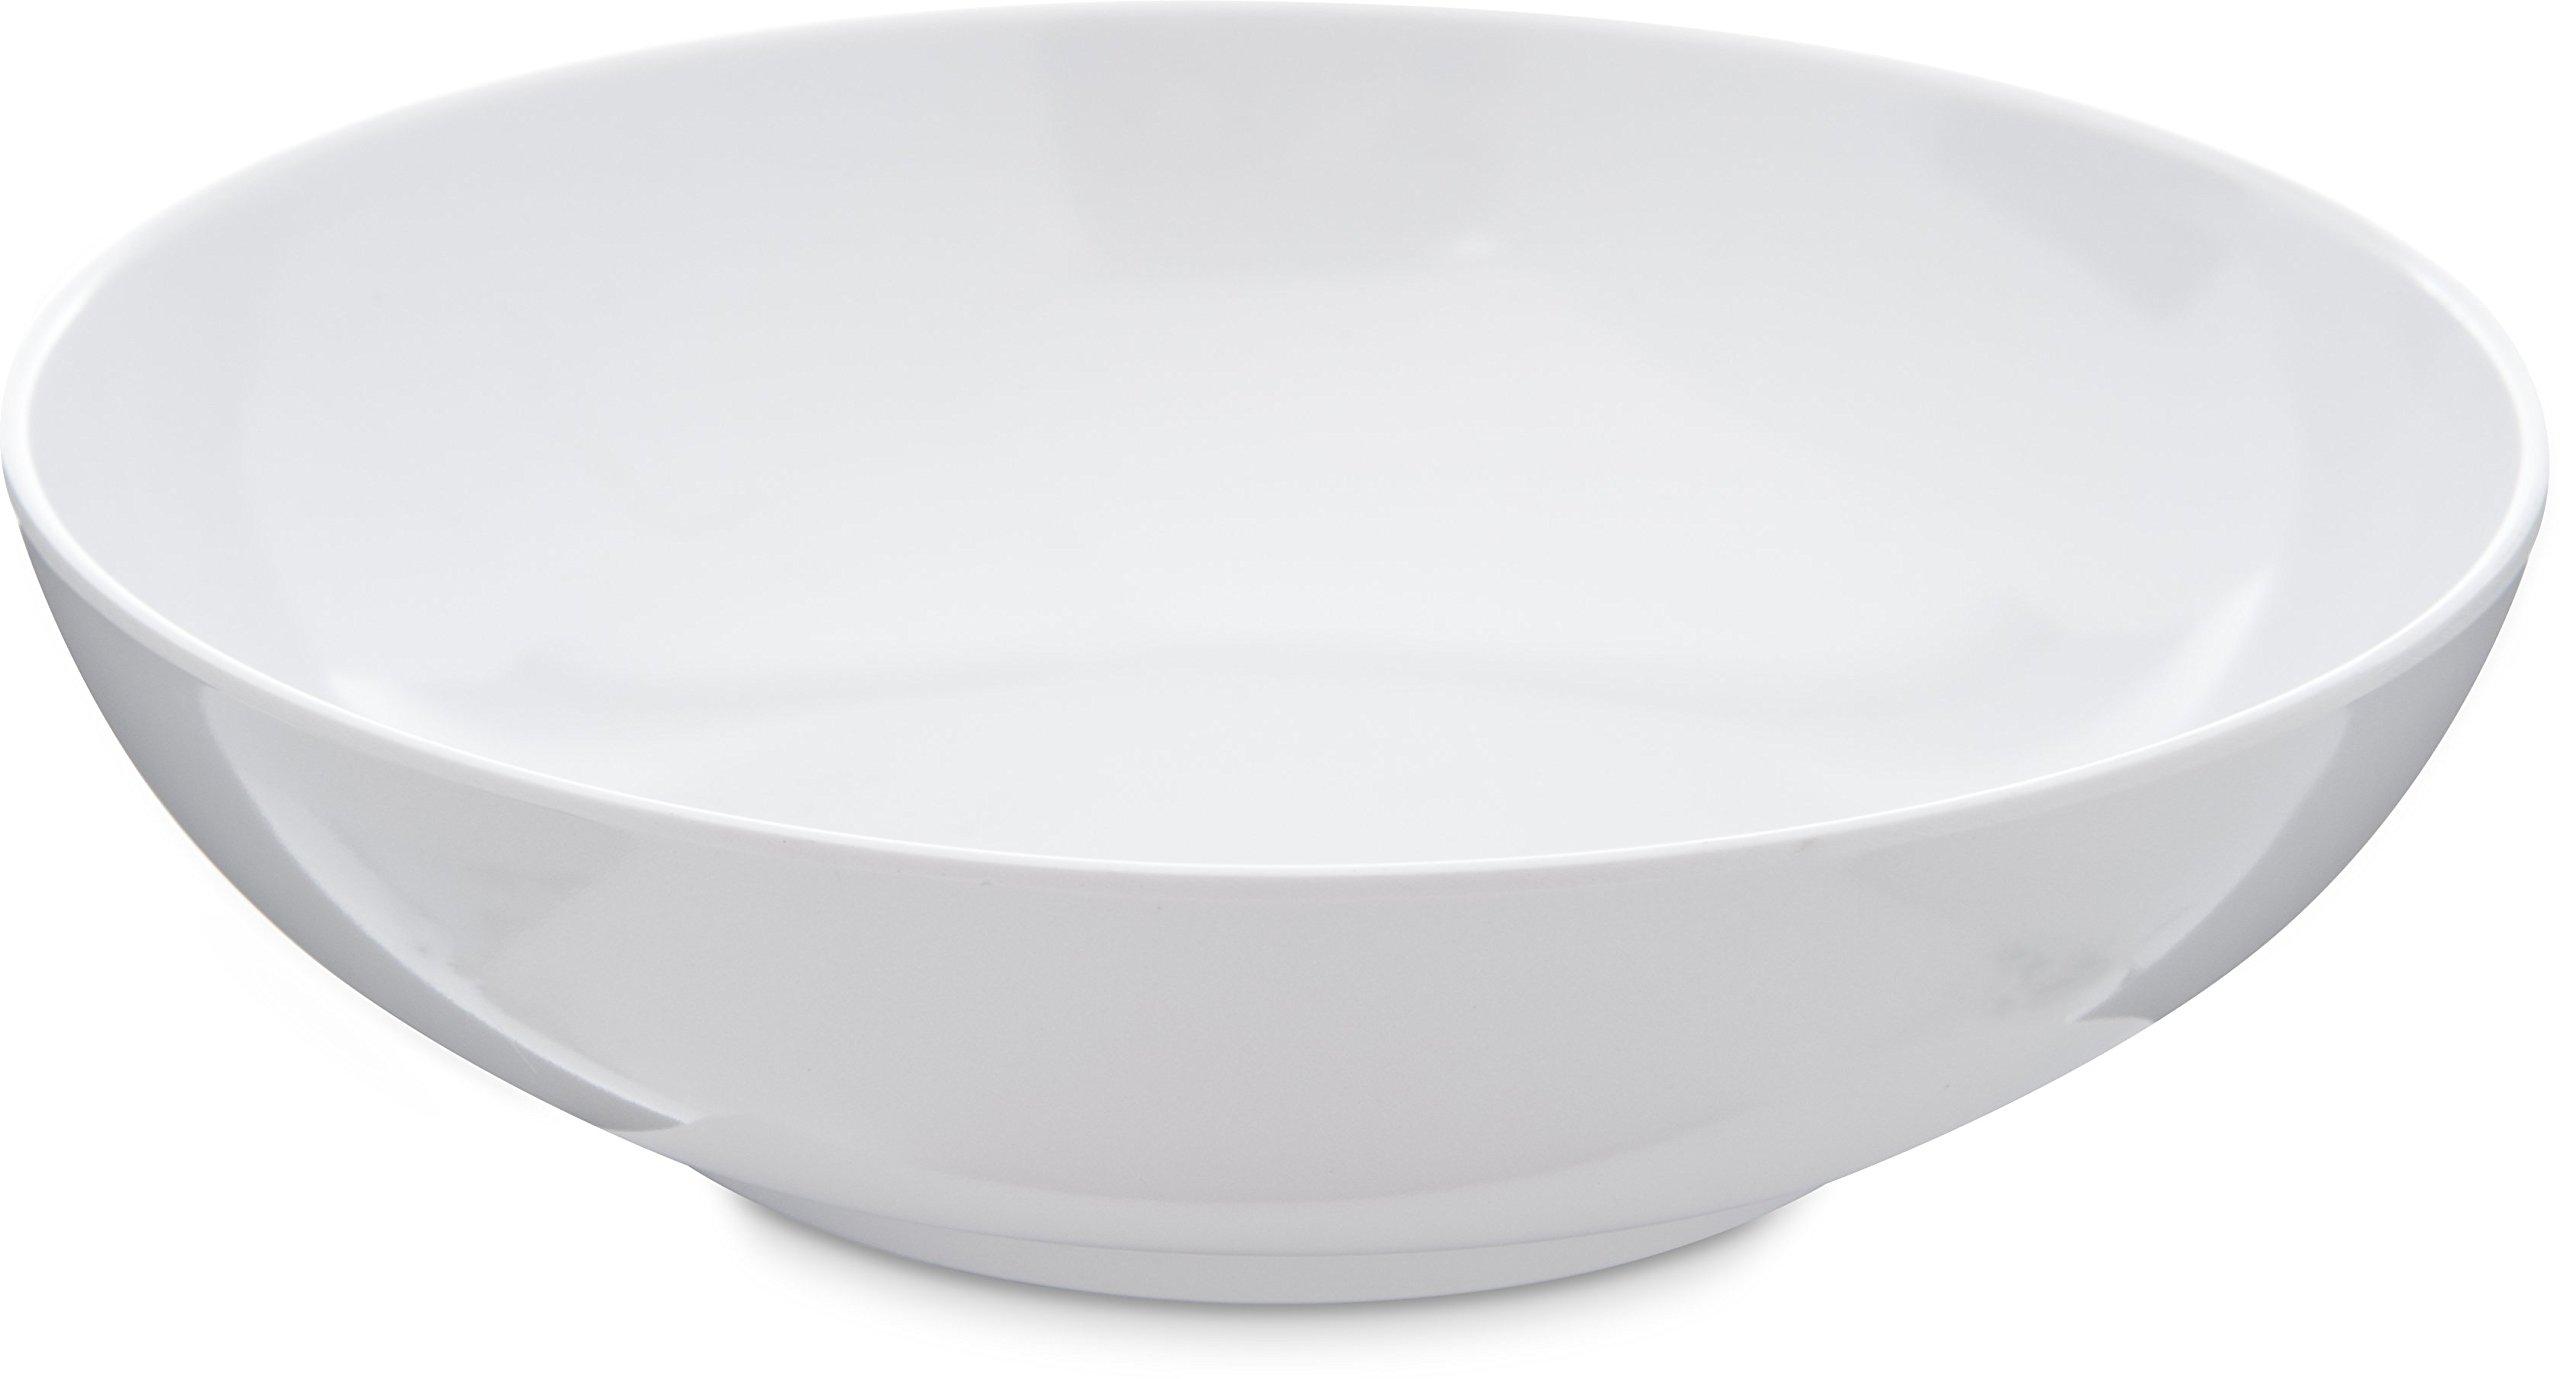 Carlisle 4381402 Epicure Soup / Salad Bowl, 20 Oz., White (Set of 12)